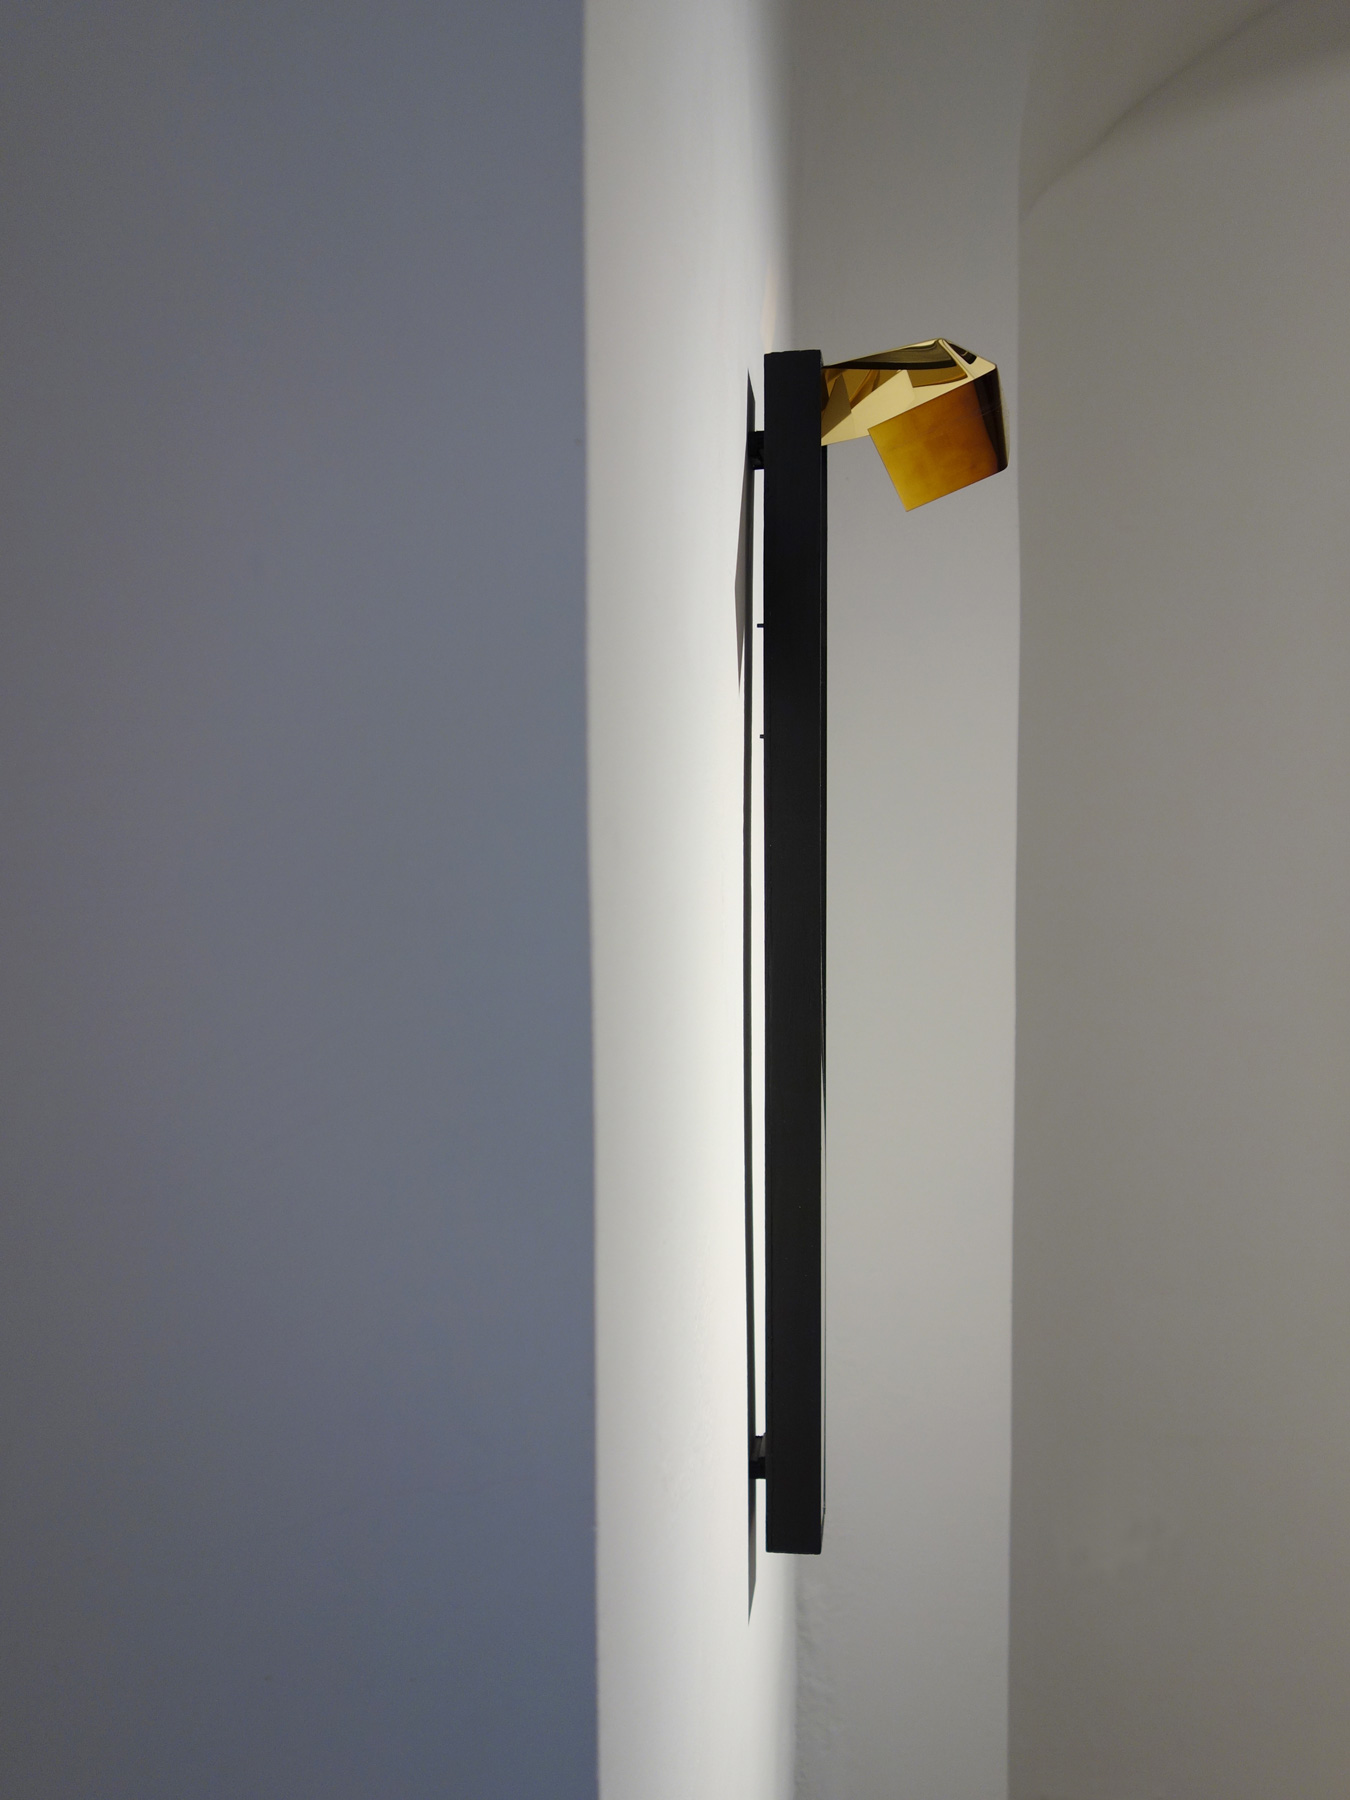 Nina Annabelle Märkl | Line and Space 2 | Ink on folded paper, wood, polished steel | 67 x 12 x 15 cm | 2017